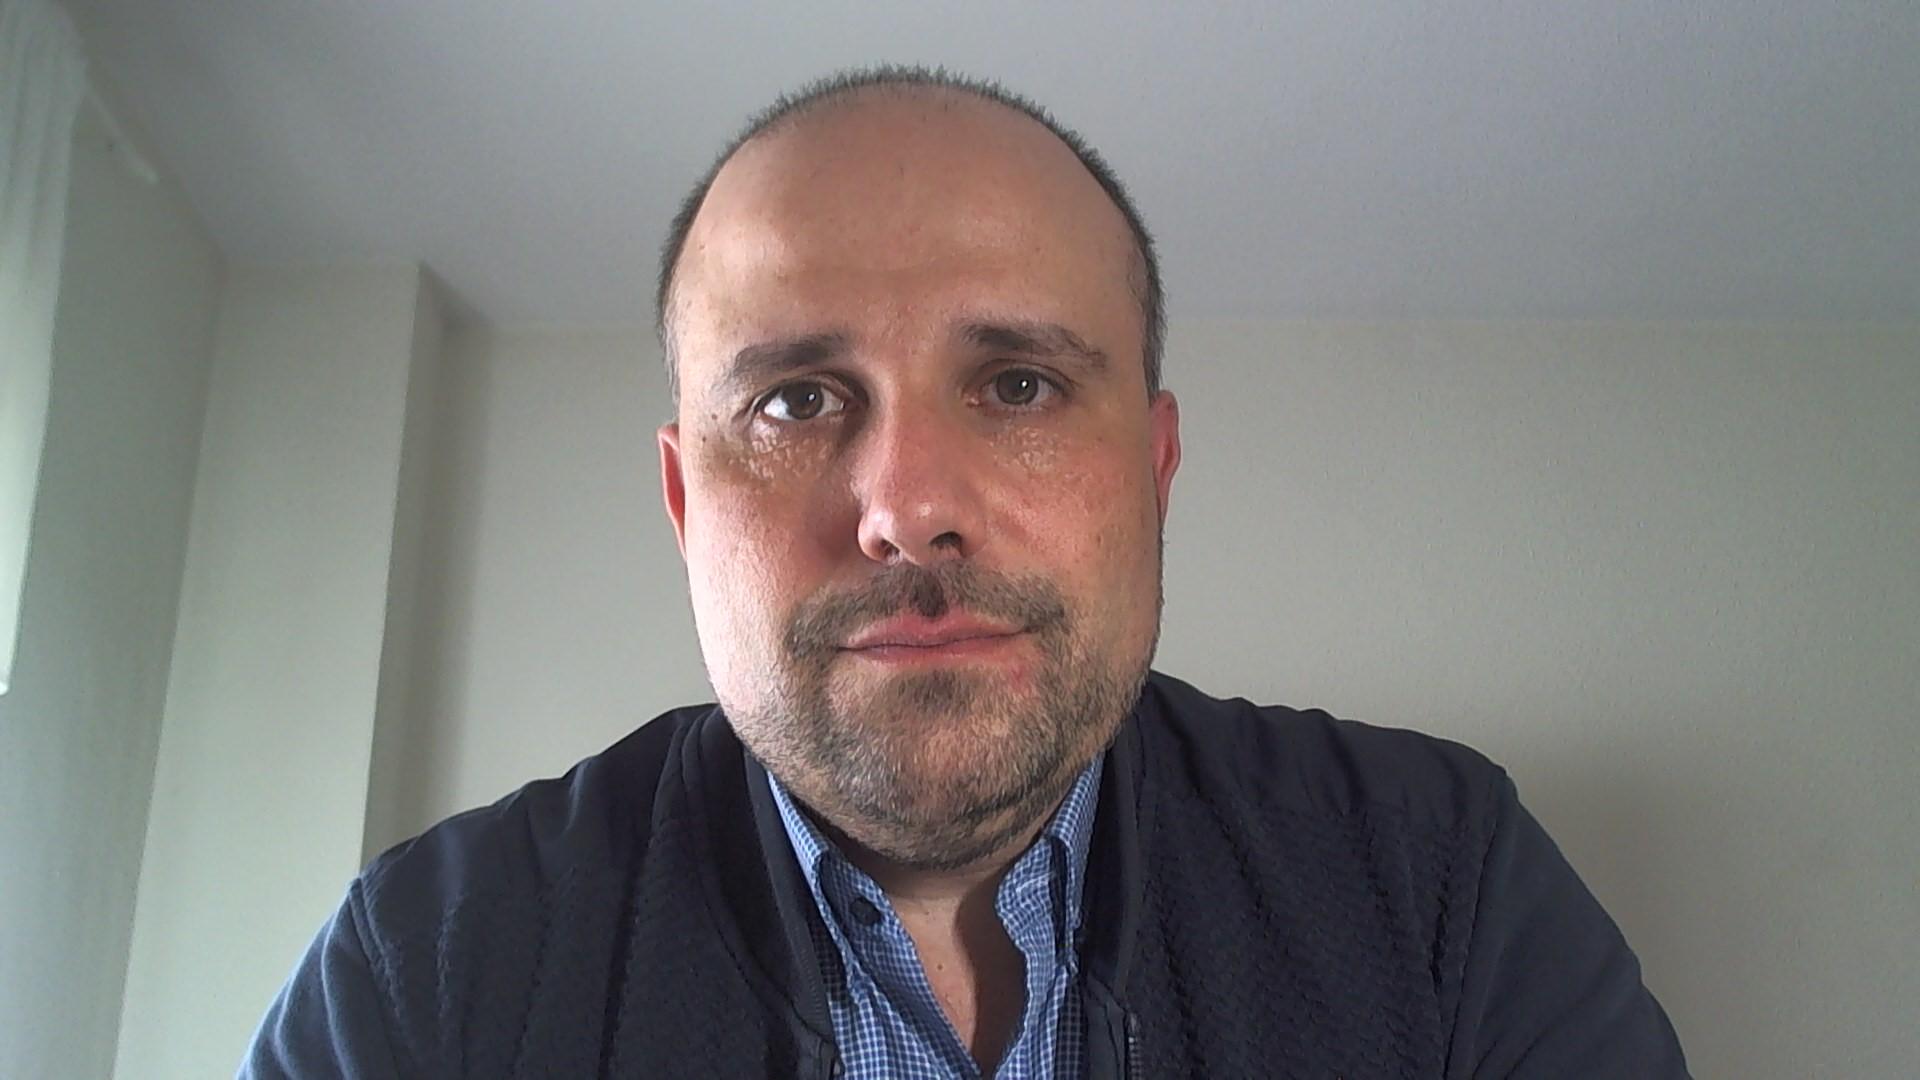 Manuel Alloza